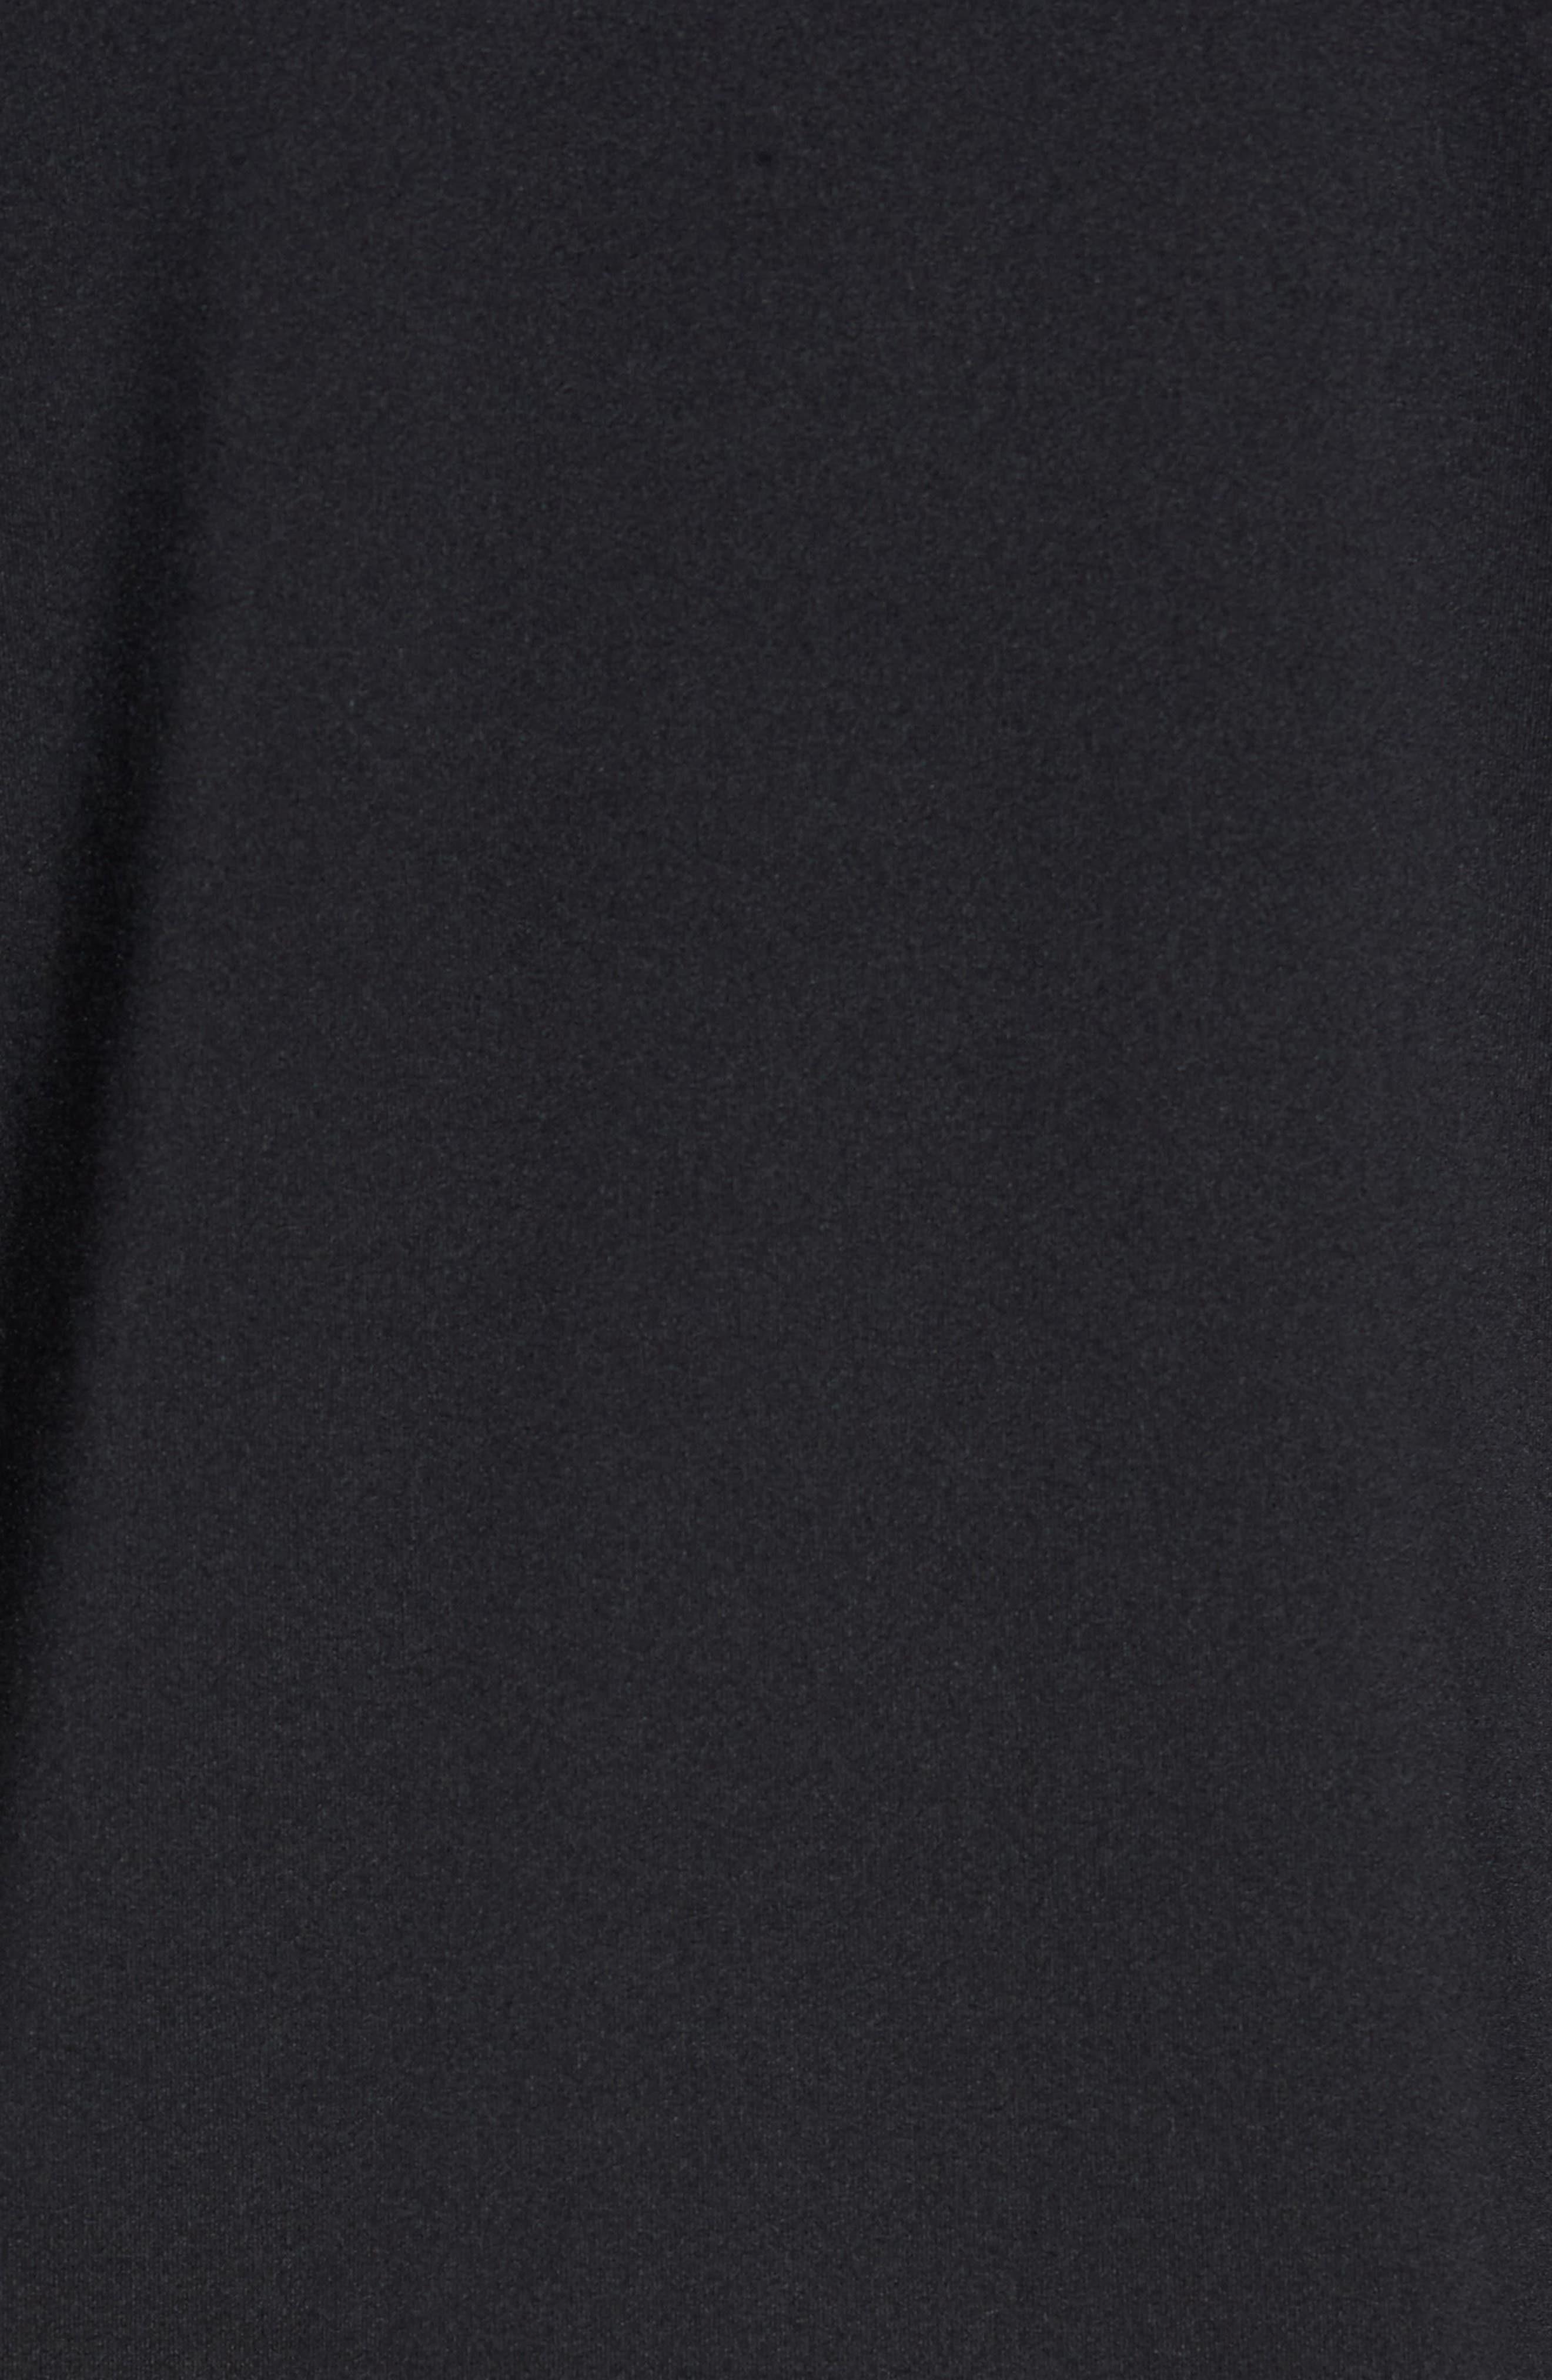 Pro Fitted Performance T-Shirt,                             Alternate thumbnail 5, color,                             BLACK/ WHITE/ WHITE